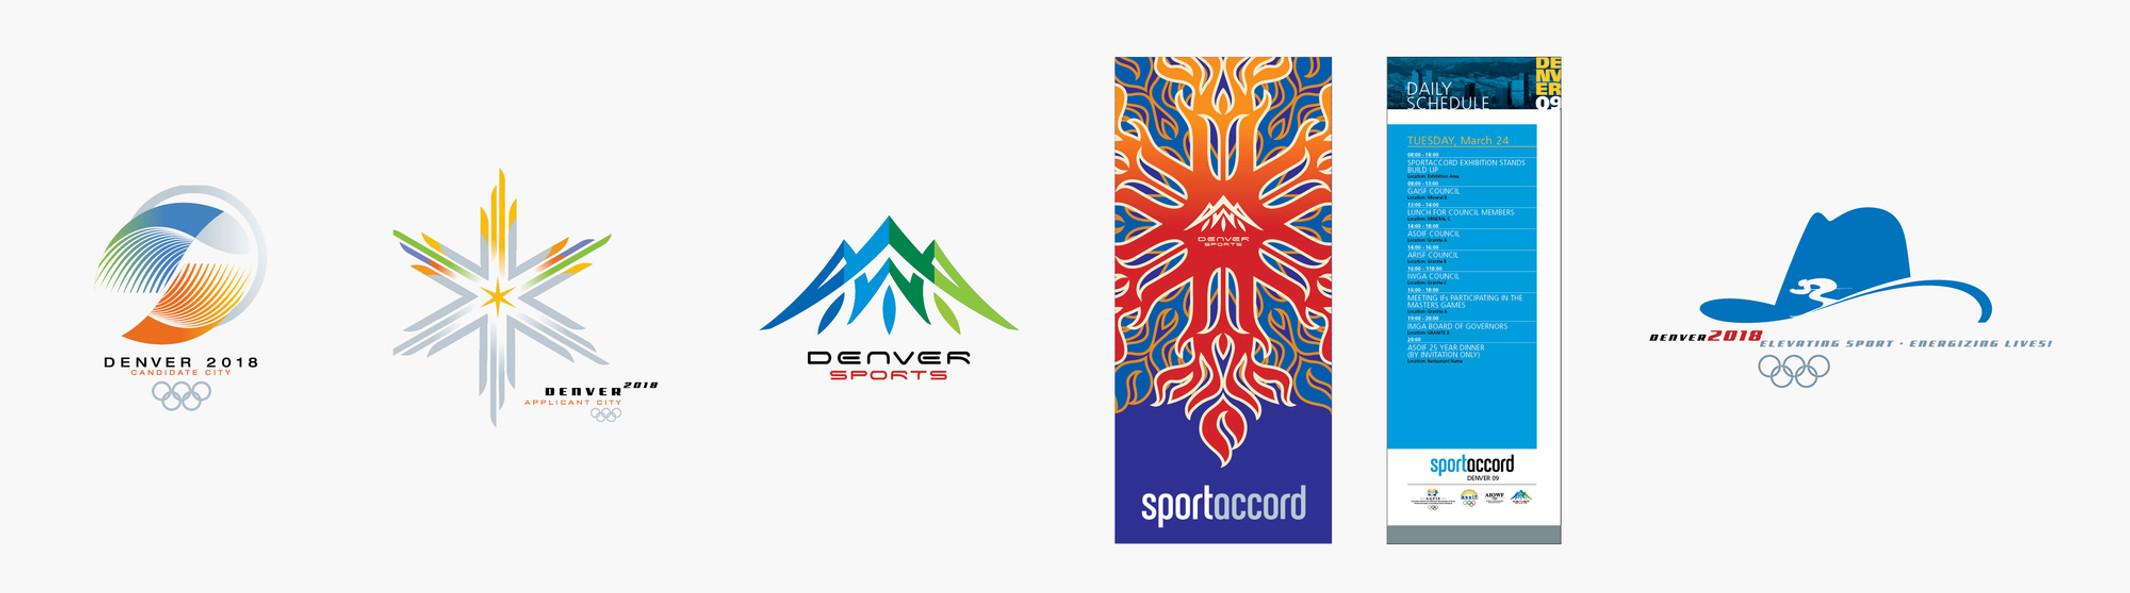 Denver Sport Commission, Colorado 2018 Olympic Bid Identity, Sportaccord (Intern. Olympic Committee - Denver)